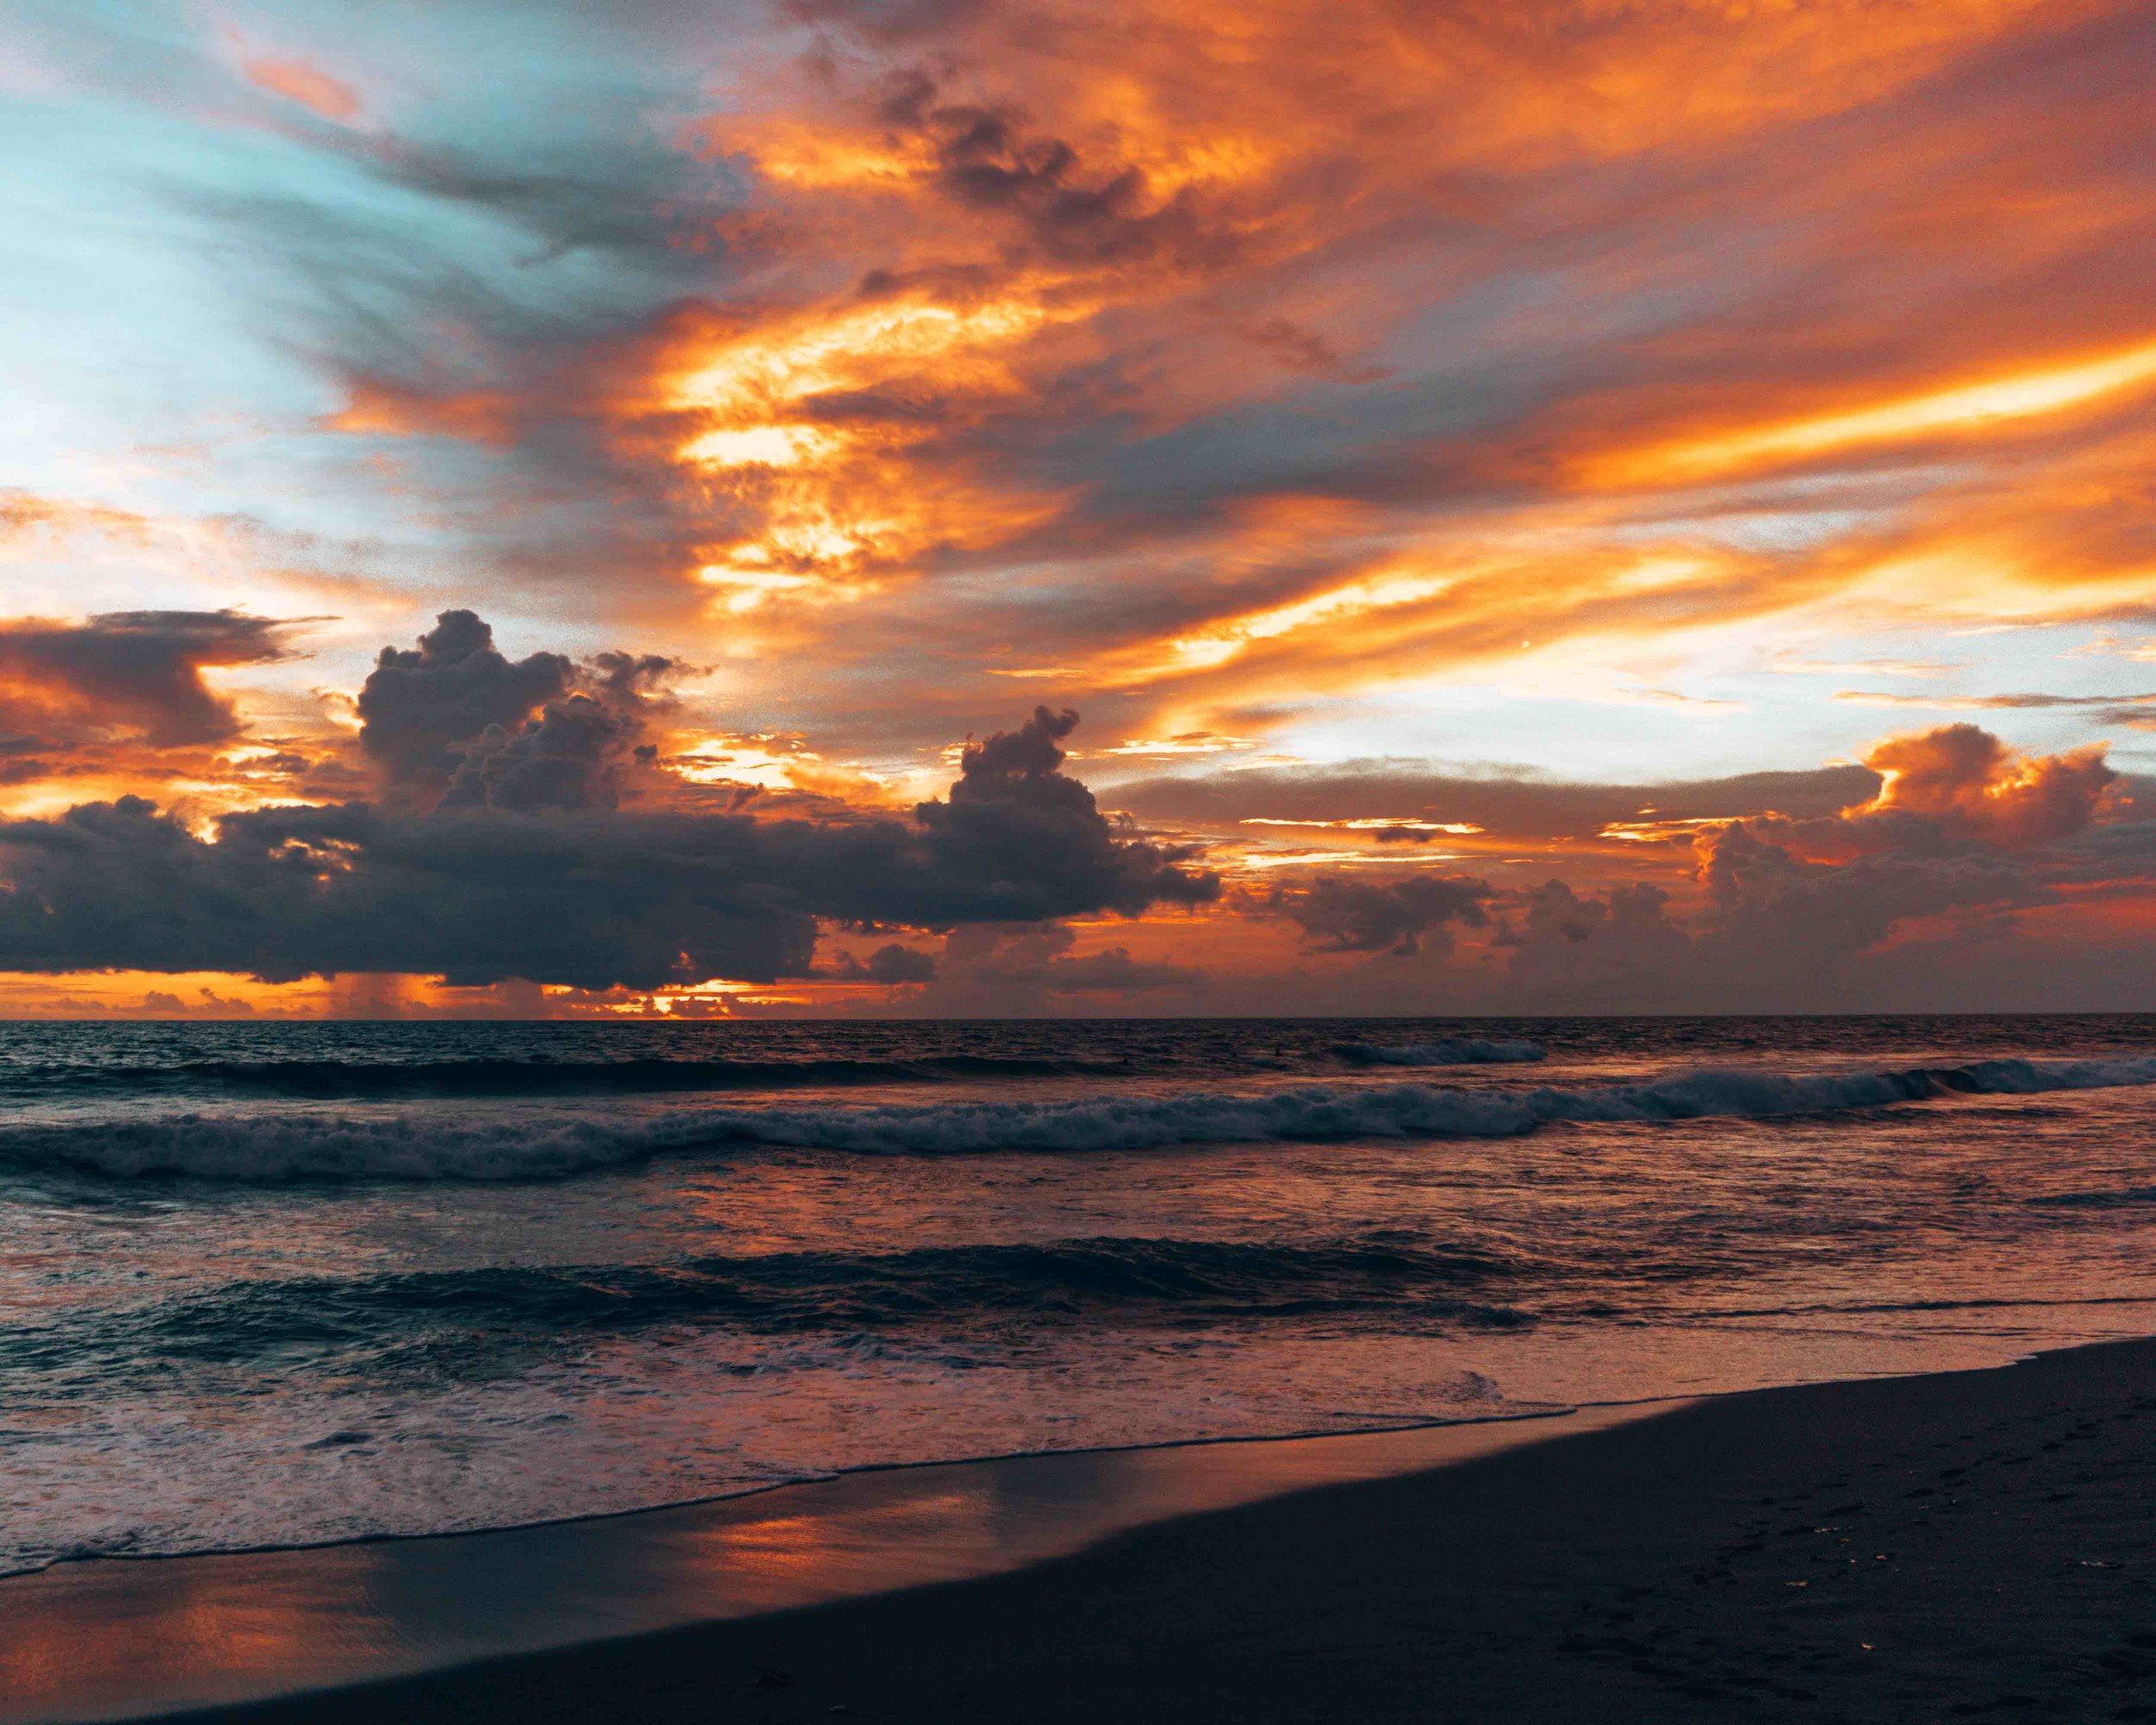 tropical_paradise_beach_island_bali_indonesia_sunset_canggu.jpg